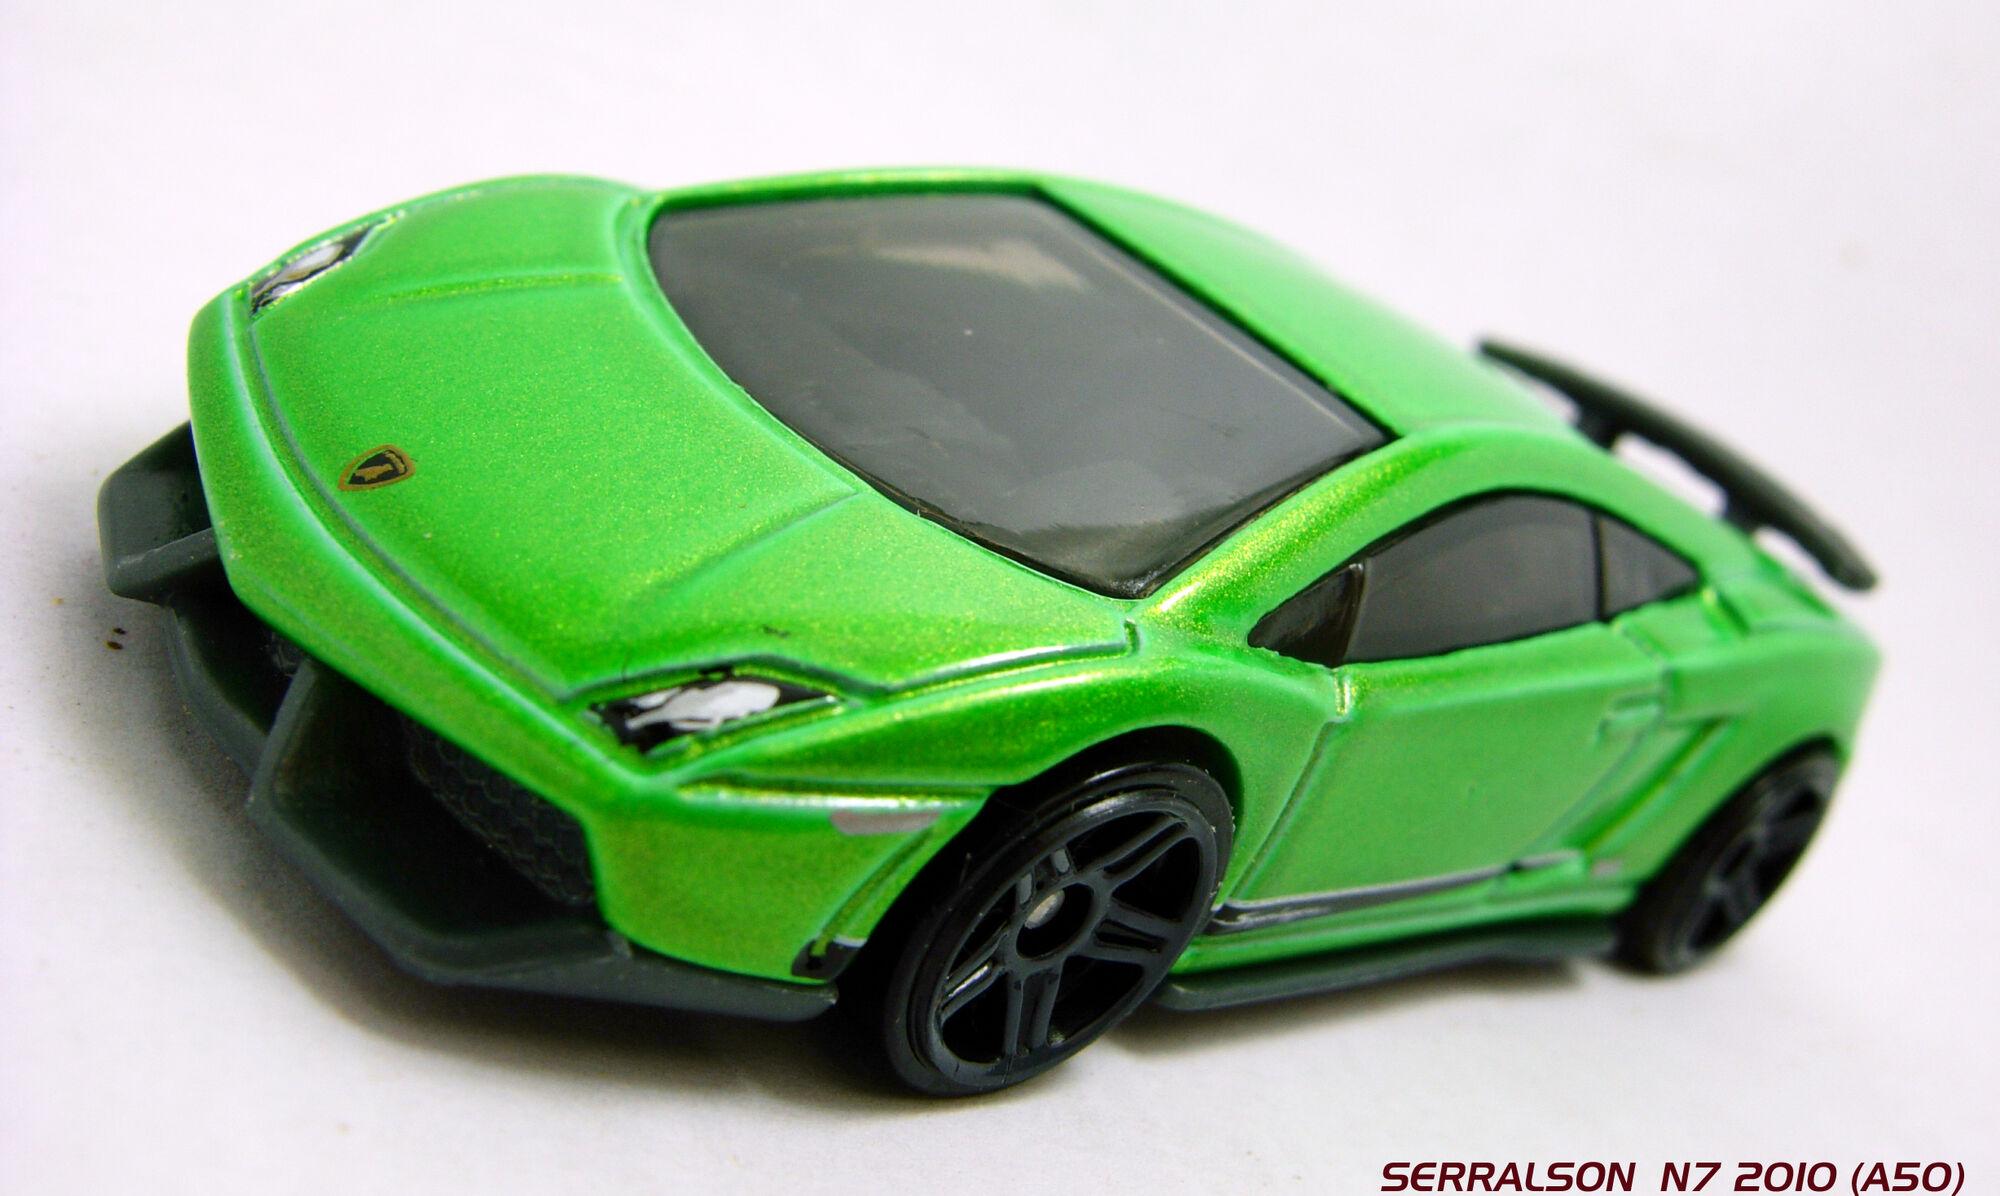 2000?cb=20101220215325 Surprising Lamborghini Gallardo Hot Wheels Wiki Cars Trend